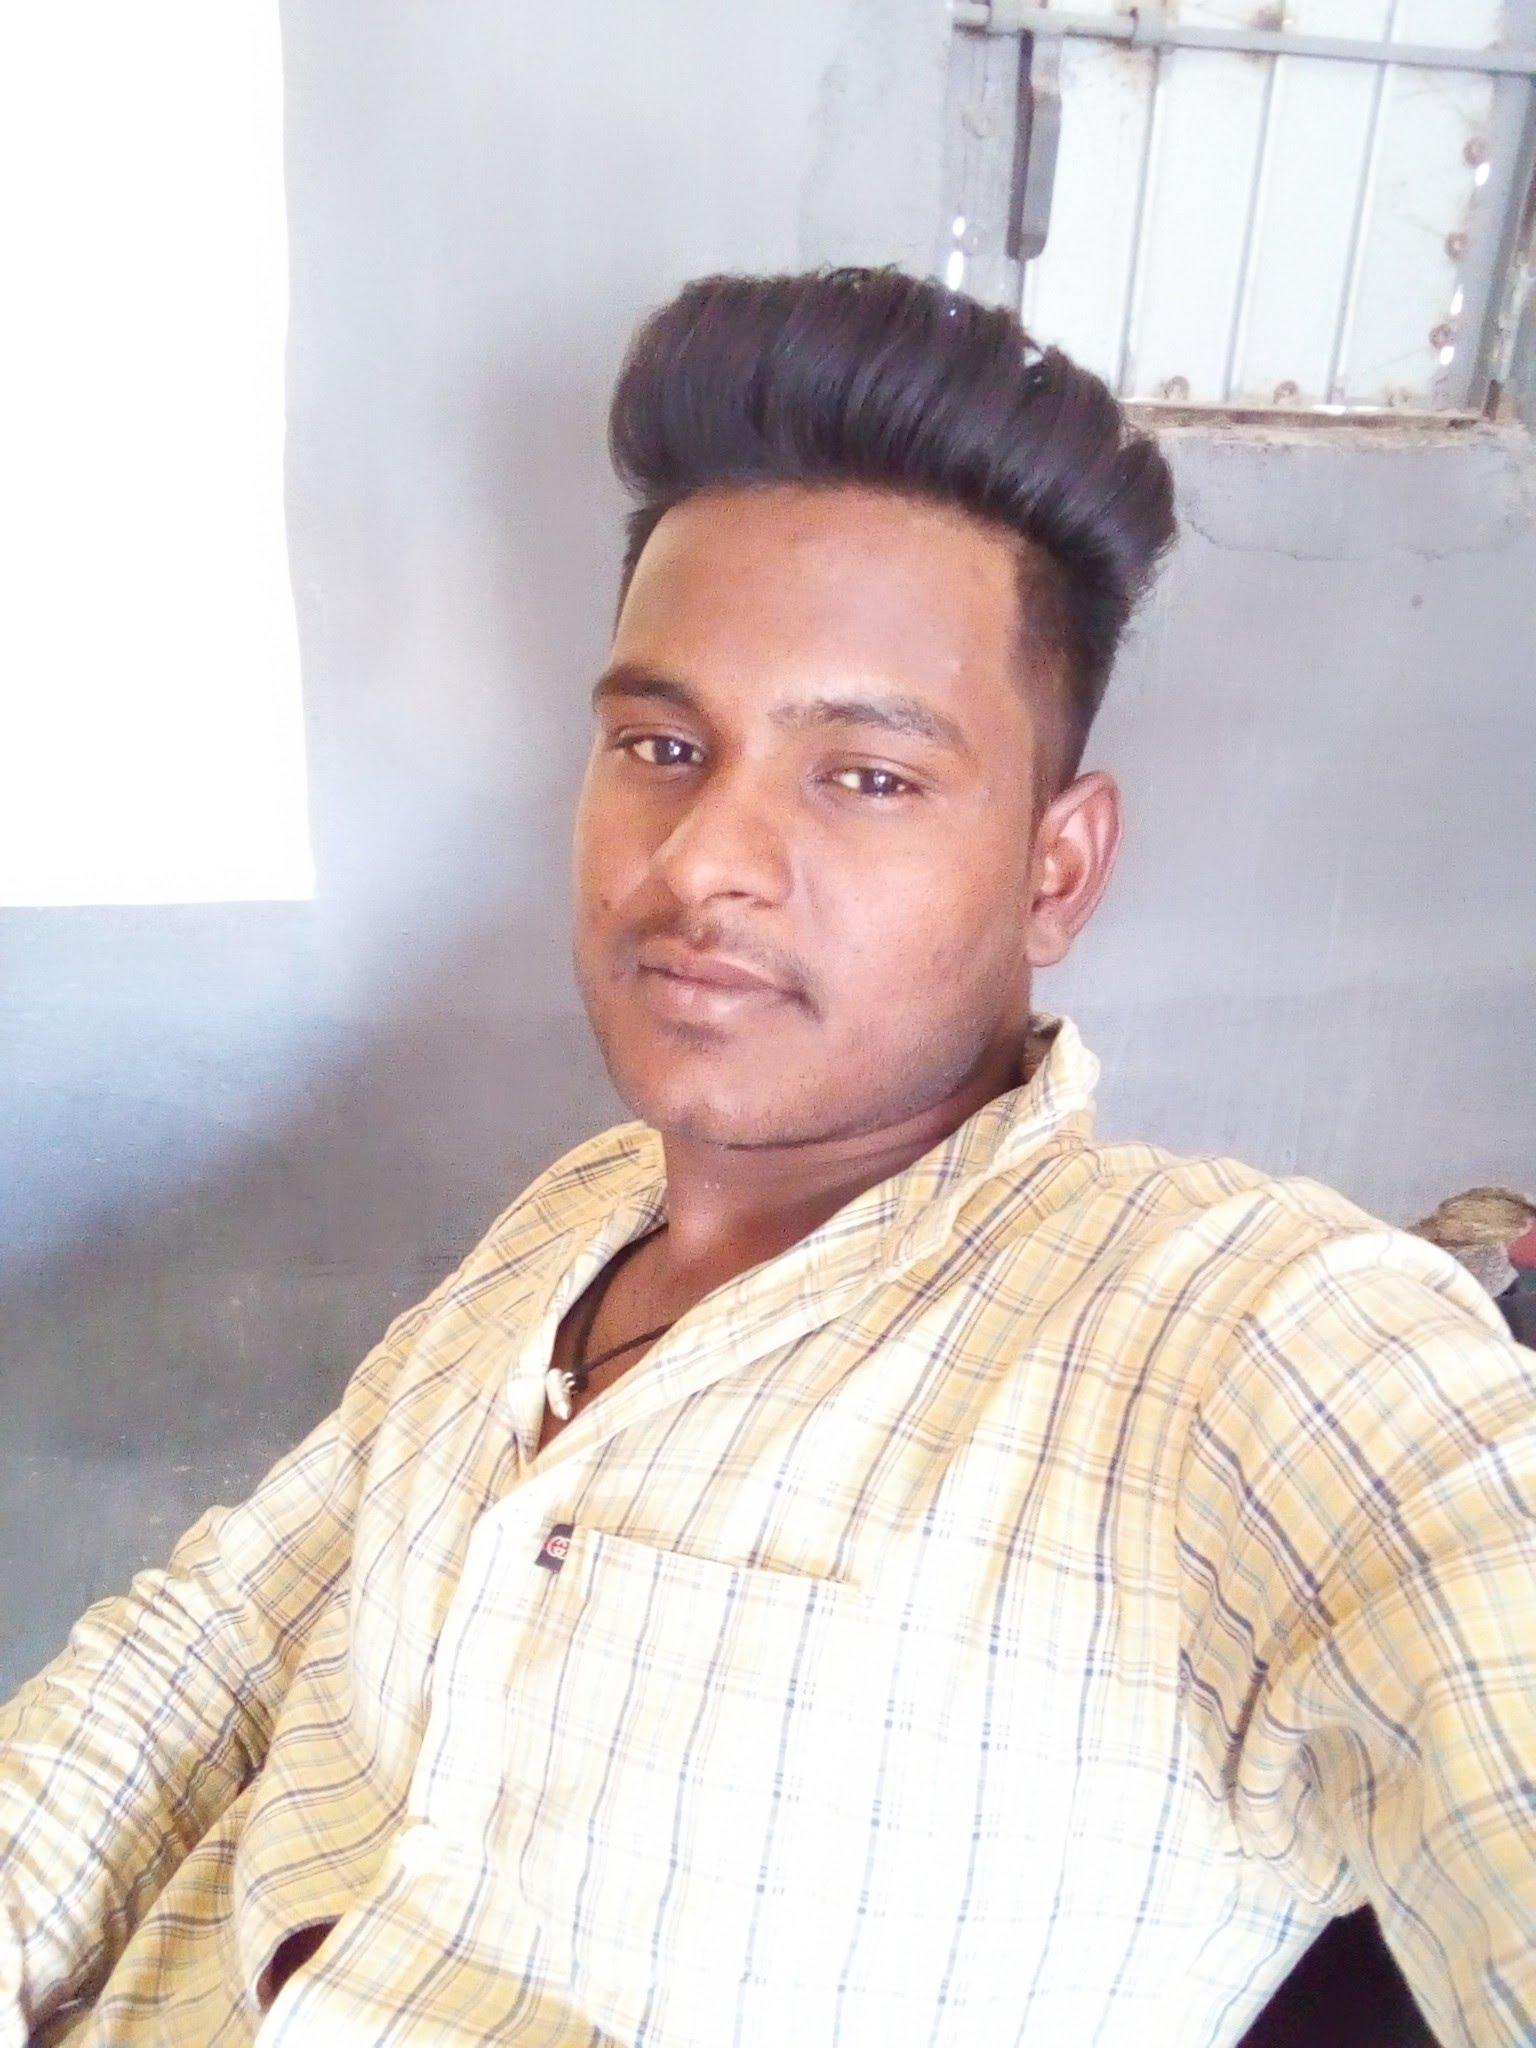 Satpal bohit in his home